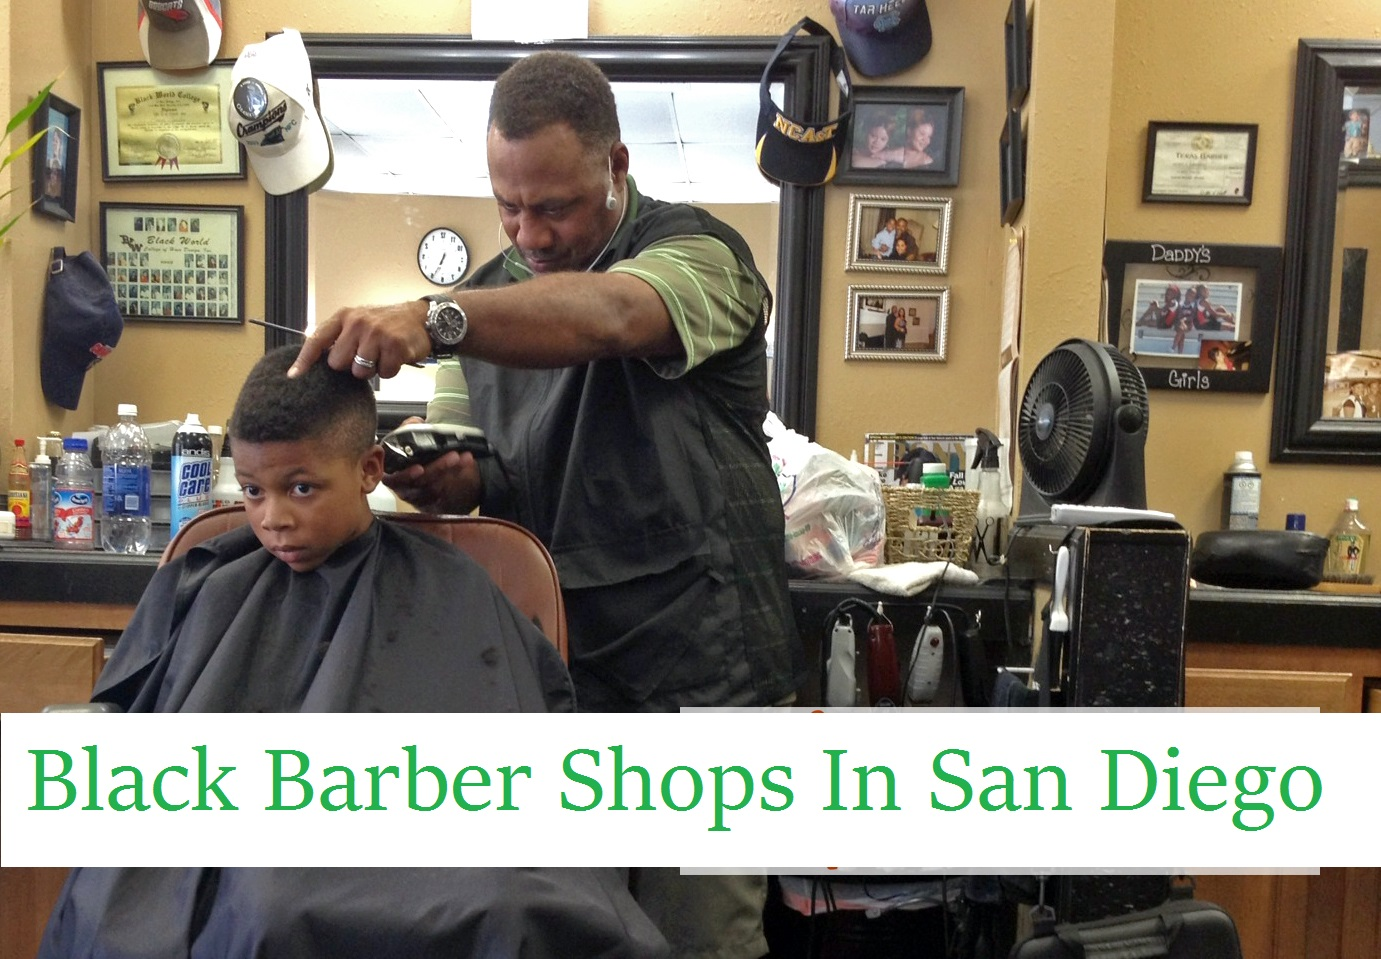 Black Barber Shops In San Diego California   Nearest & Closest